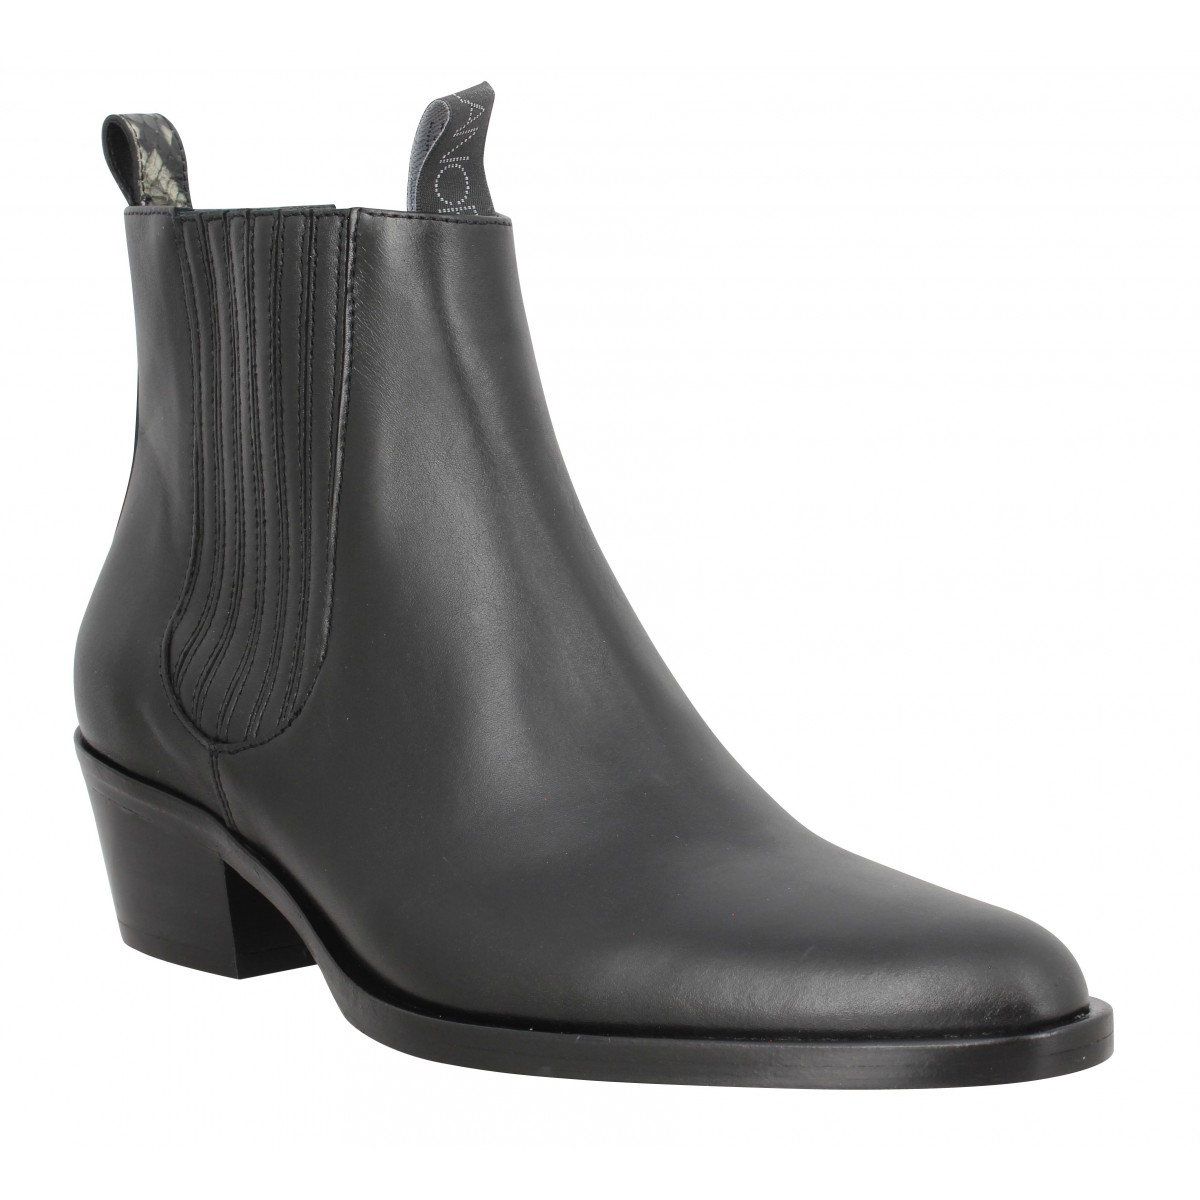 Bottines FREE LANCE Jane 5 Deco Chelsea Boot cuir lisse Femme Noir